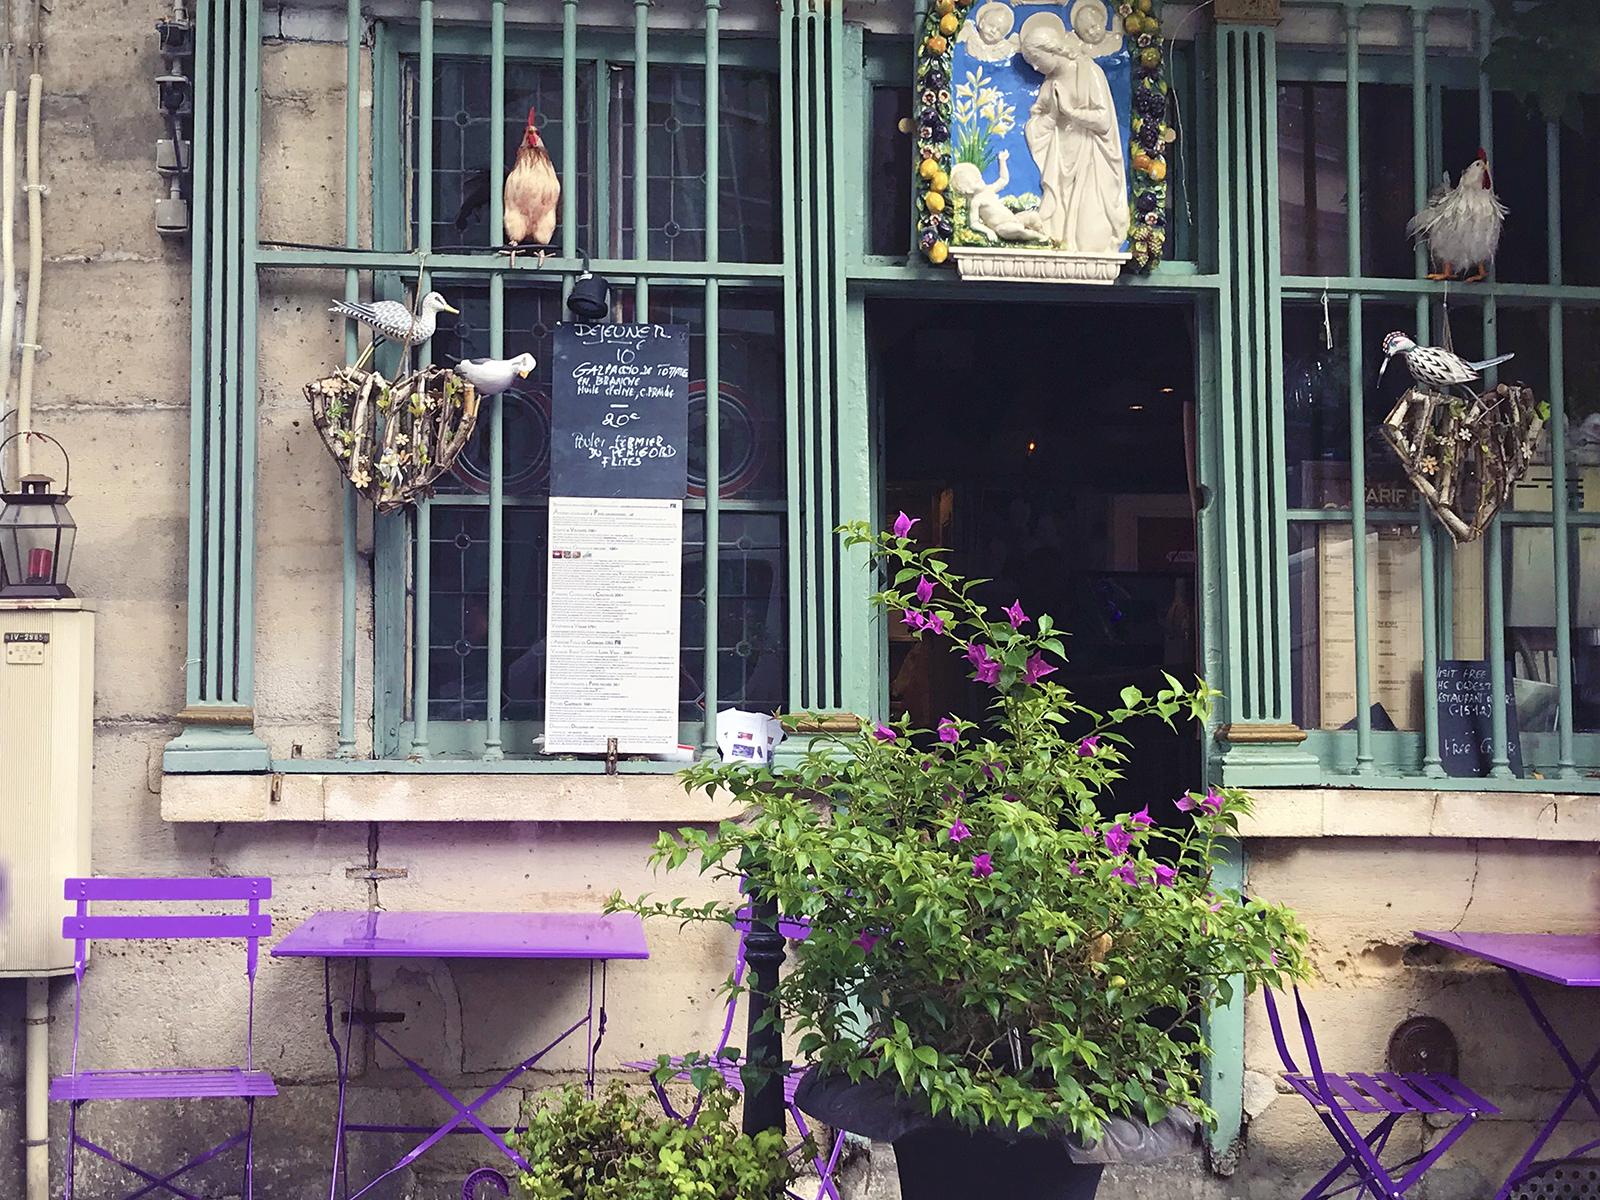 Insta-Paris: 12 Orte in Paris für das perfekte Instagram-Foto